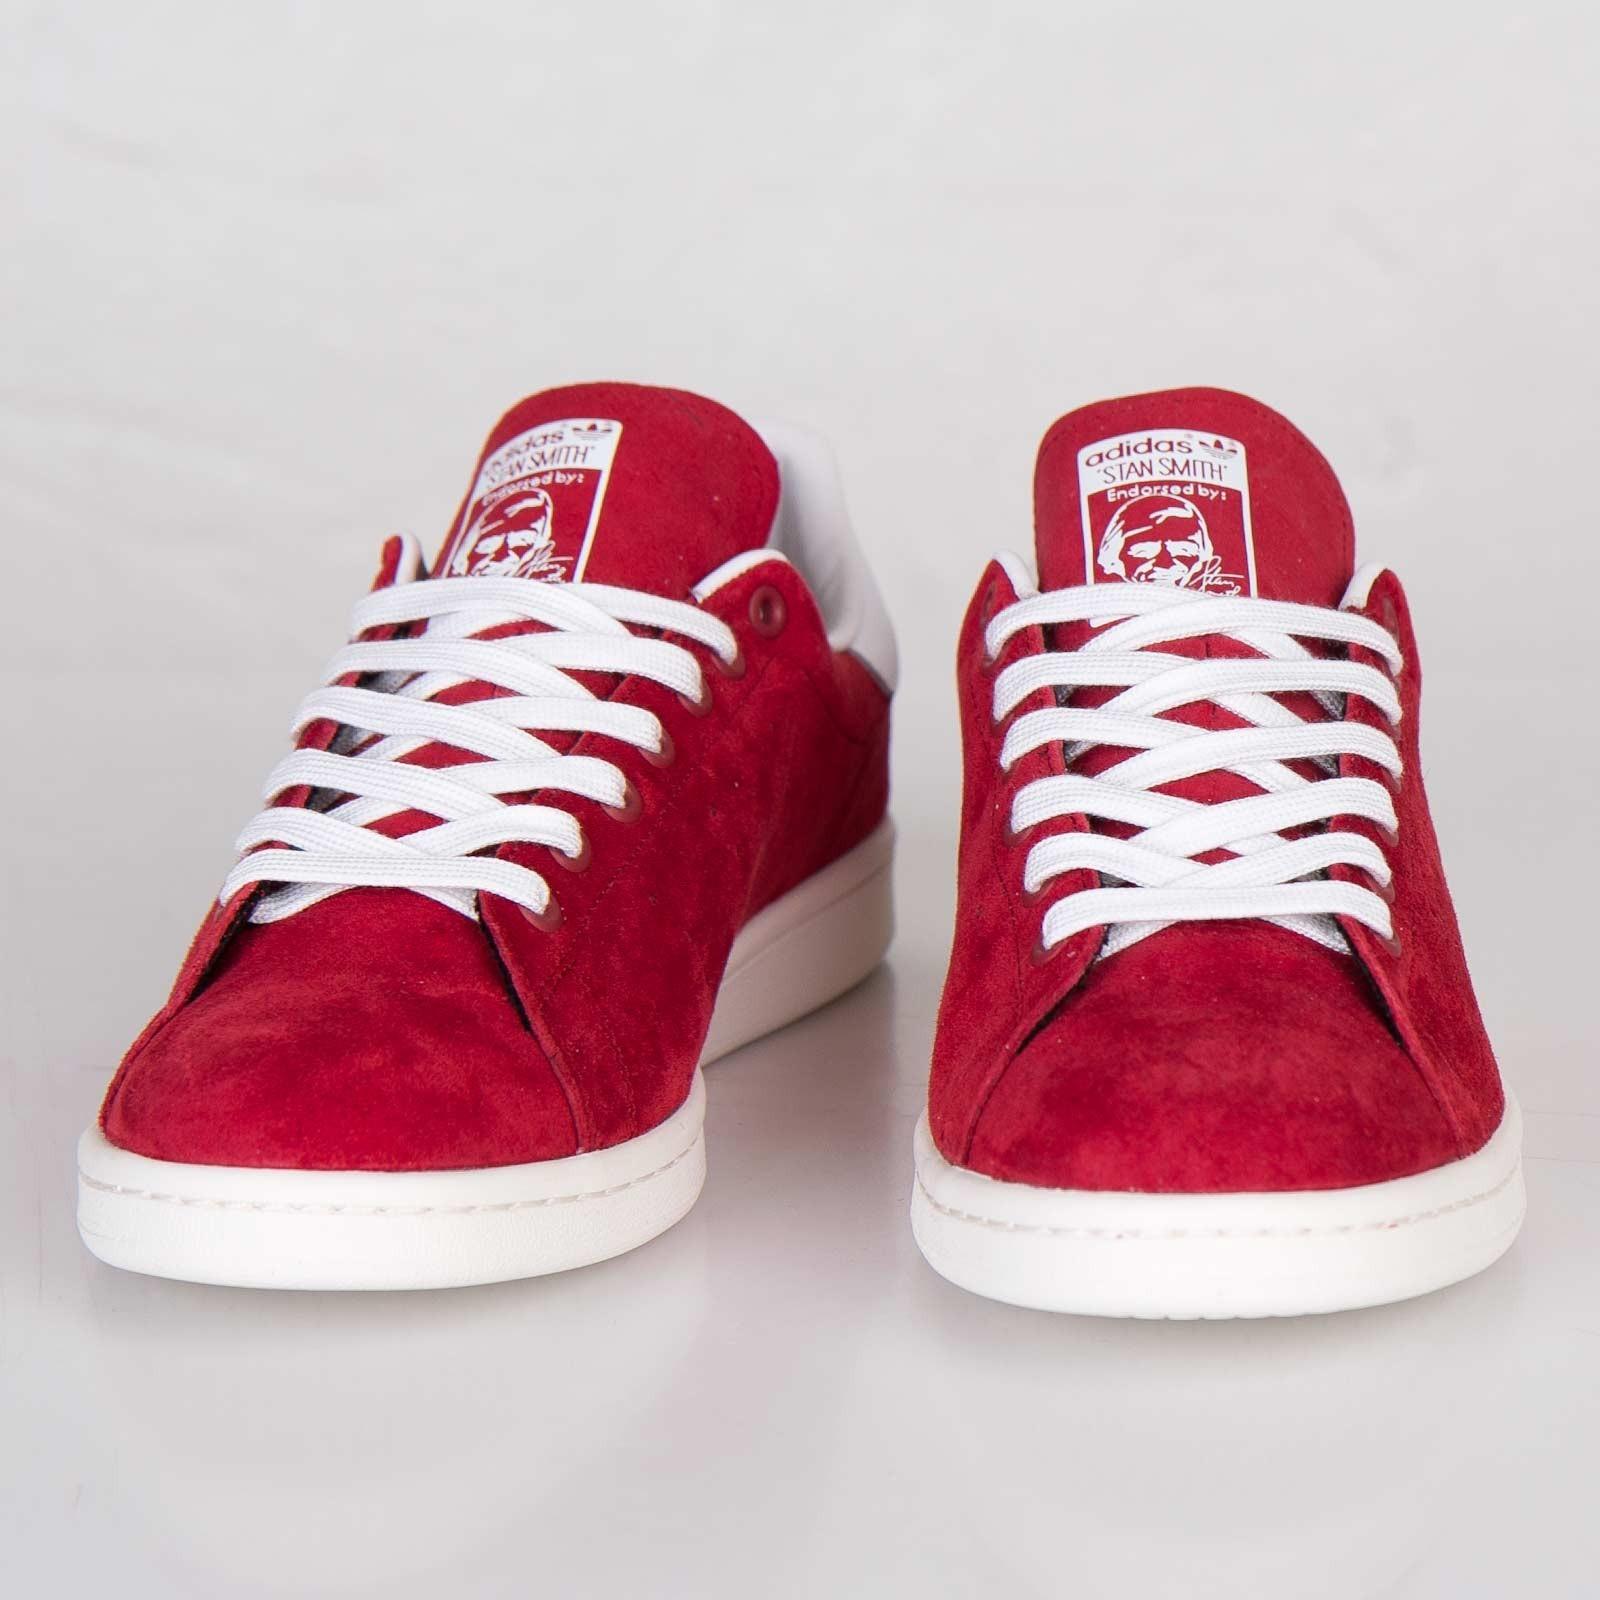 meilleur site web b1438 6cccc adidas stan smith rouge daim femme